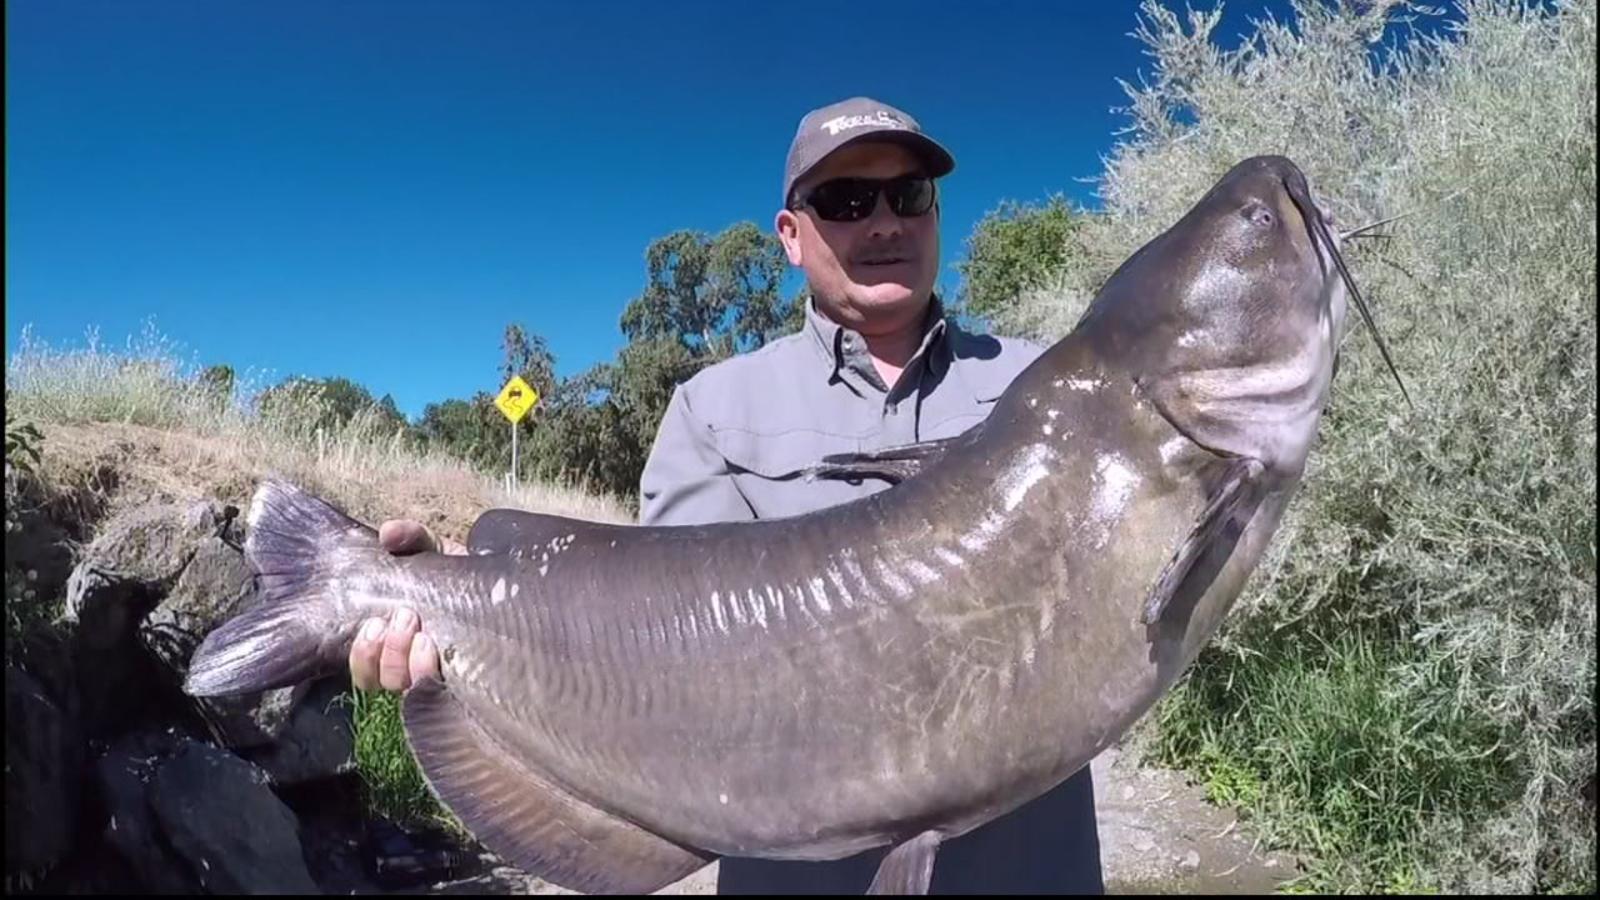 Solano County man catches colossal catfish, may break world record